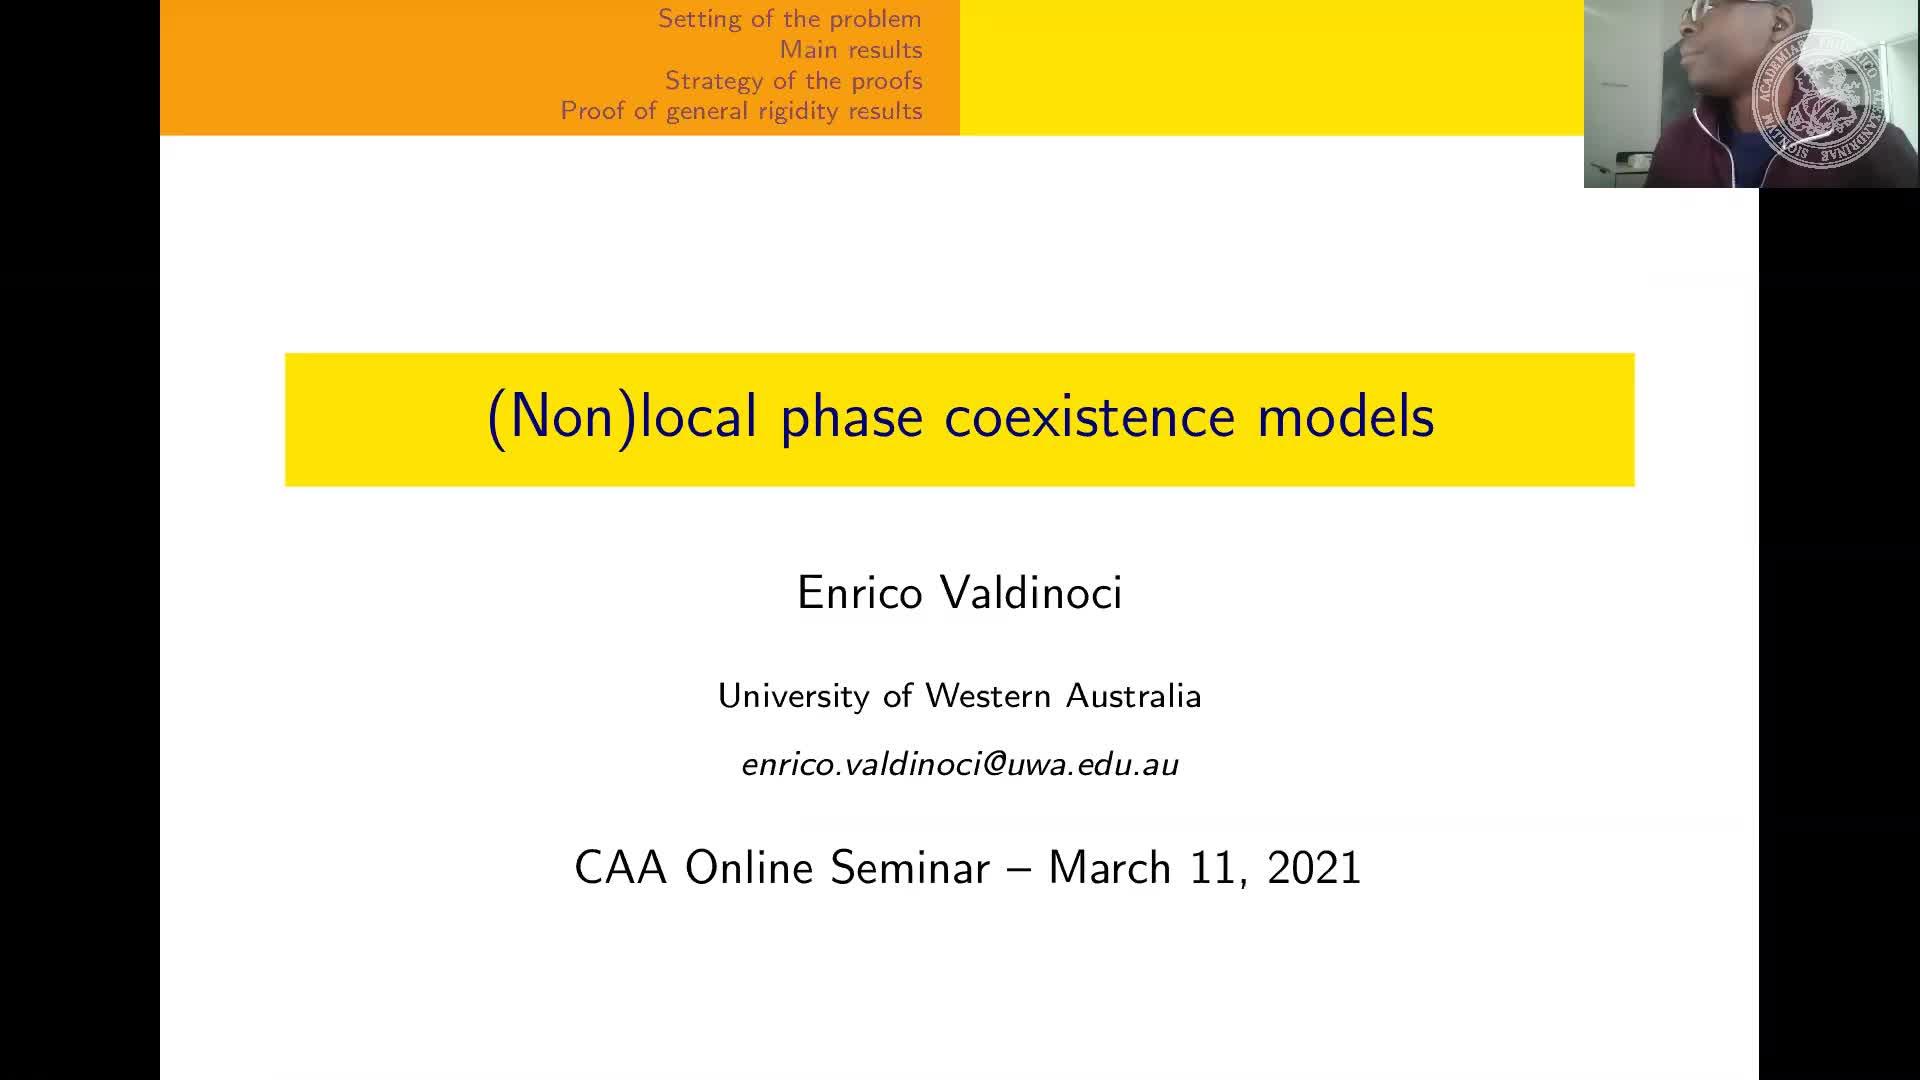 (Non)local phase coexistence models (E. Valdinoci, The University of Western Australia, Australia) preview image